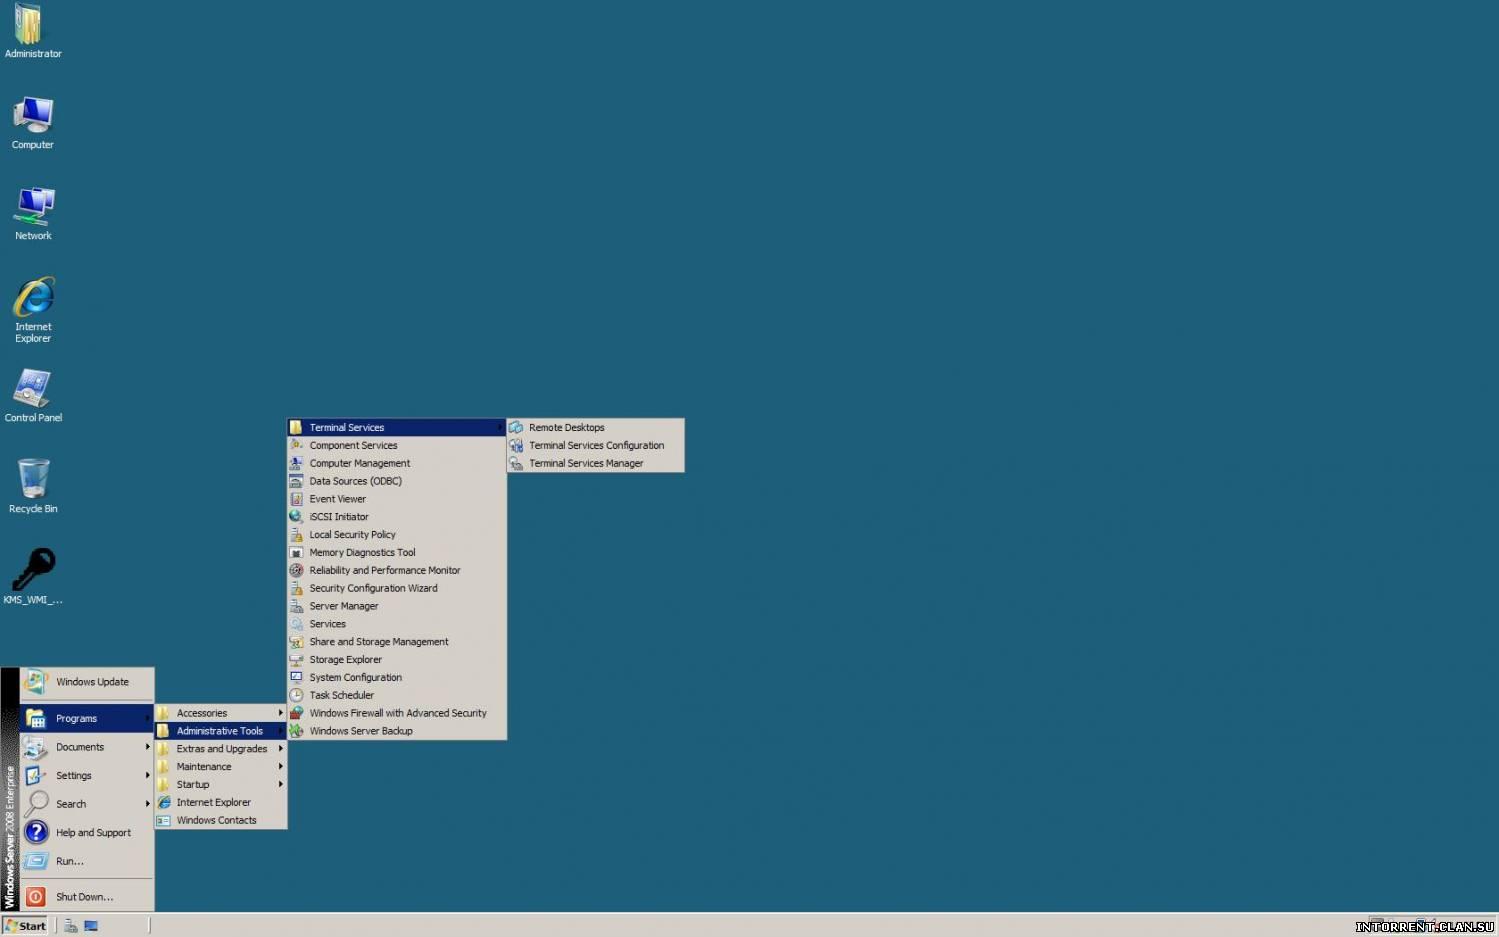 Torrent windows home server 2011 iso guitarmediazone.